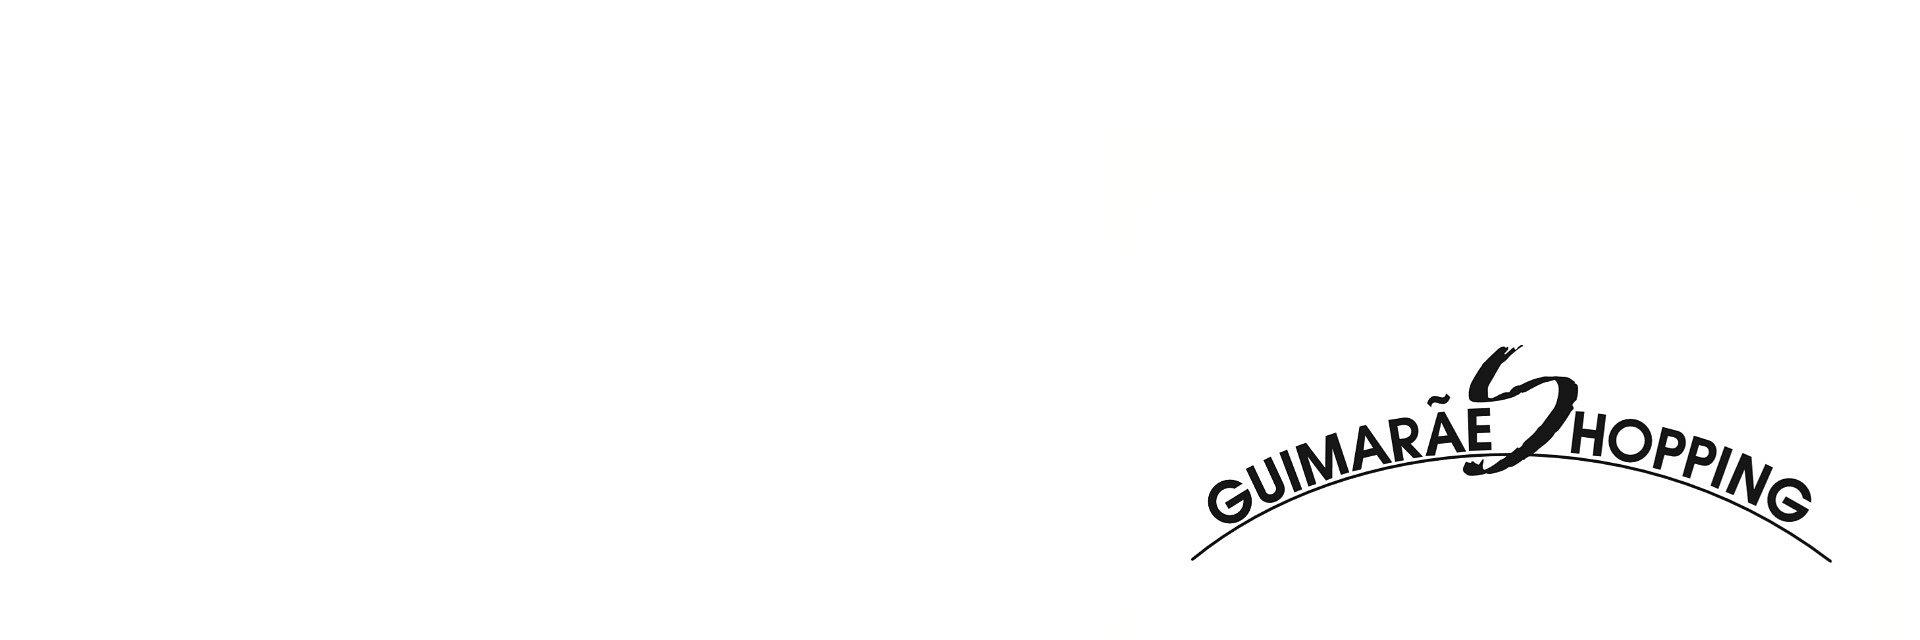 Celebre a Páscoa no GuimarãeShopping